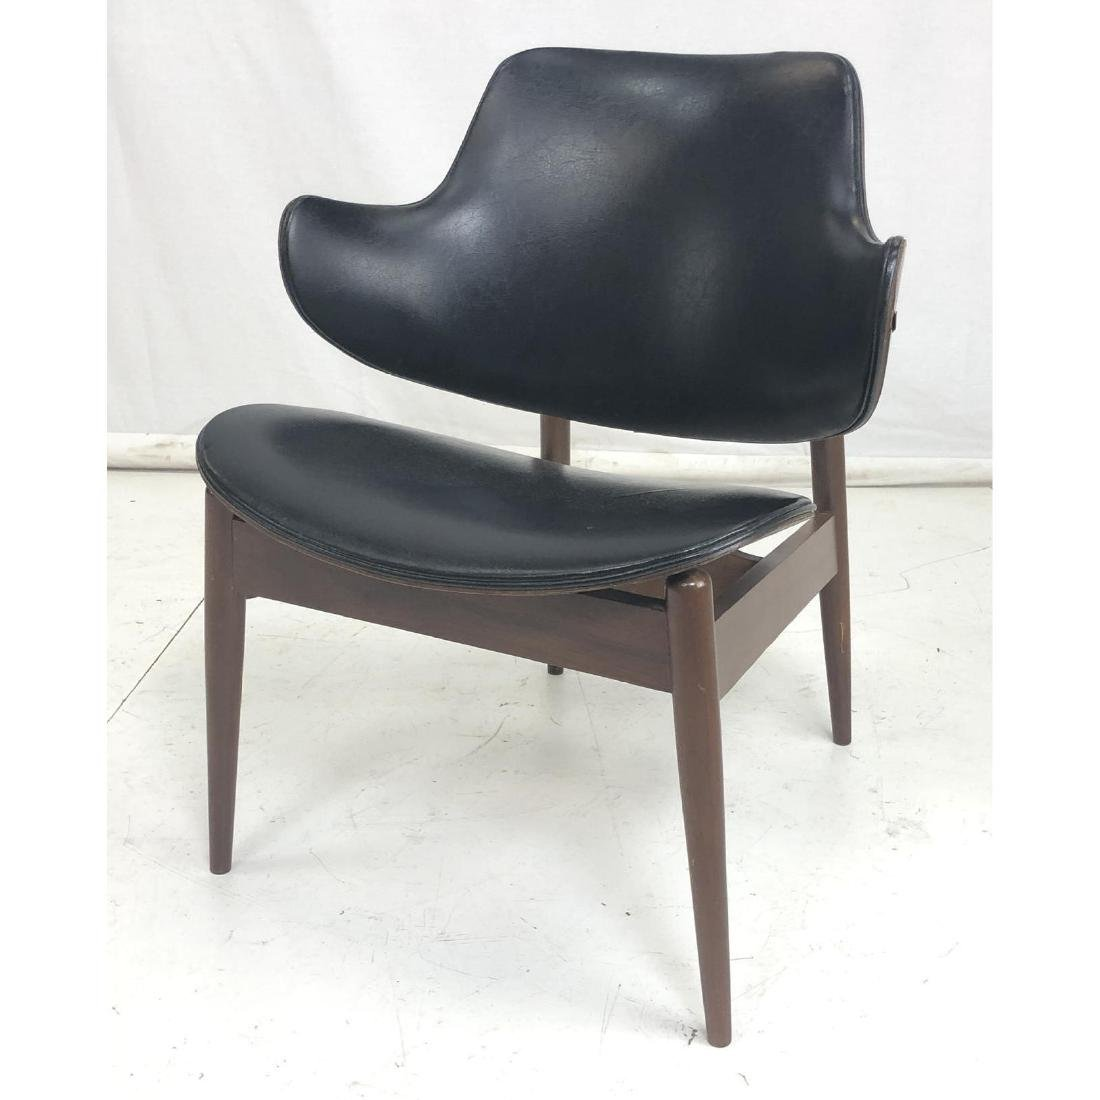 KOFOD LARSEN Modernist Lounge Chair. Teak Molded